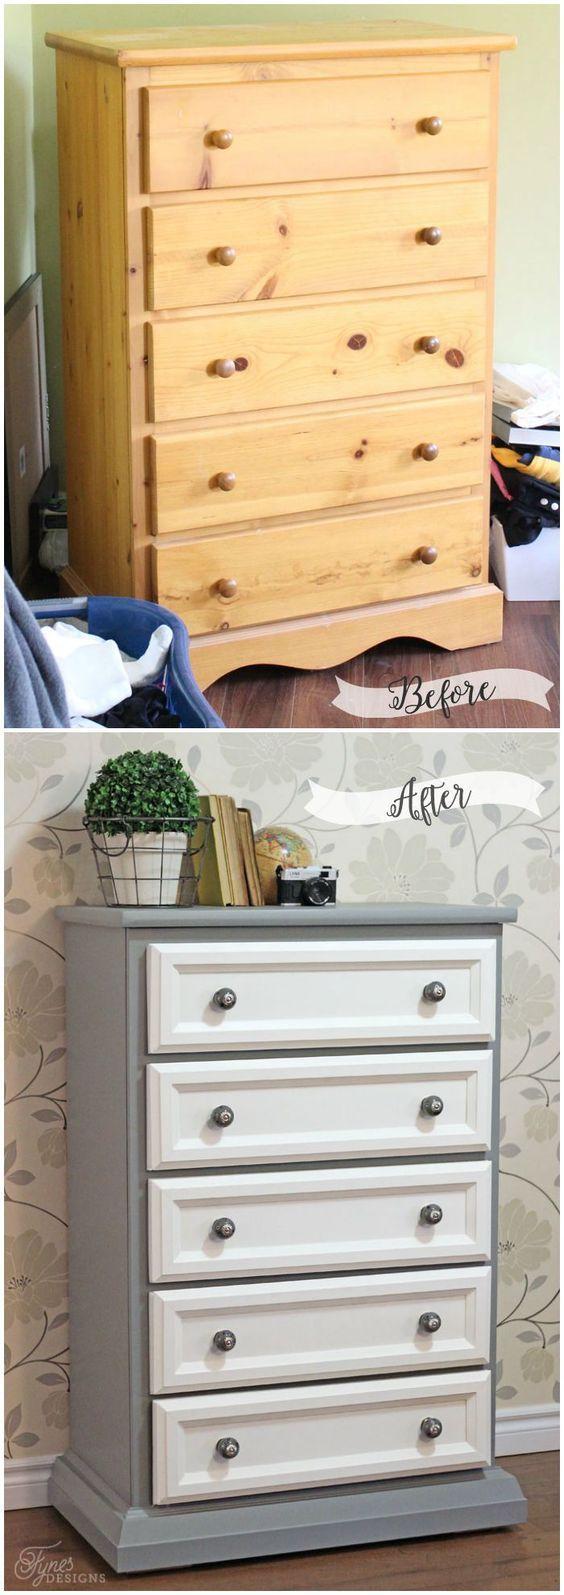 Best 25 tall dresser ideas on pinterest bedroom dresser decorating distressed bedroom - Tall bedroom dressers ...